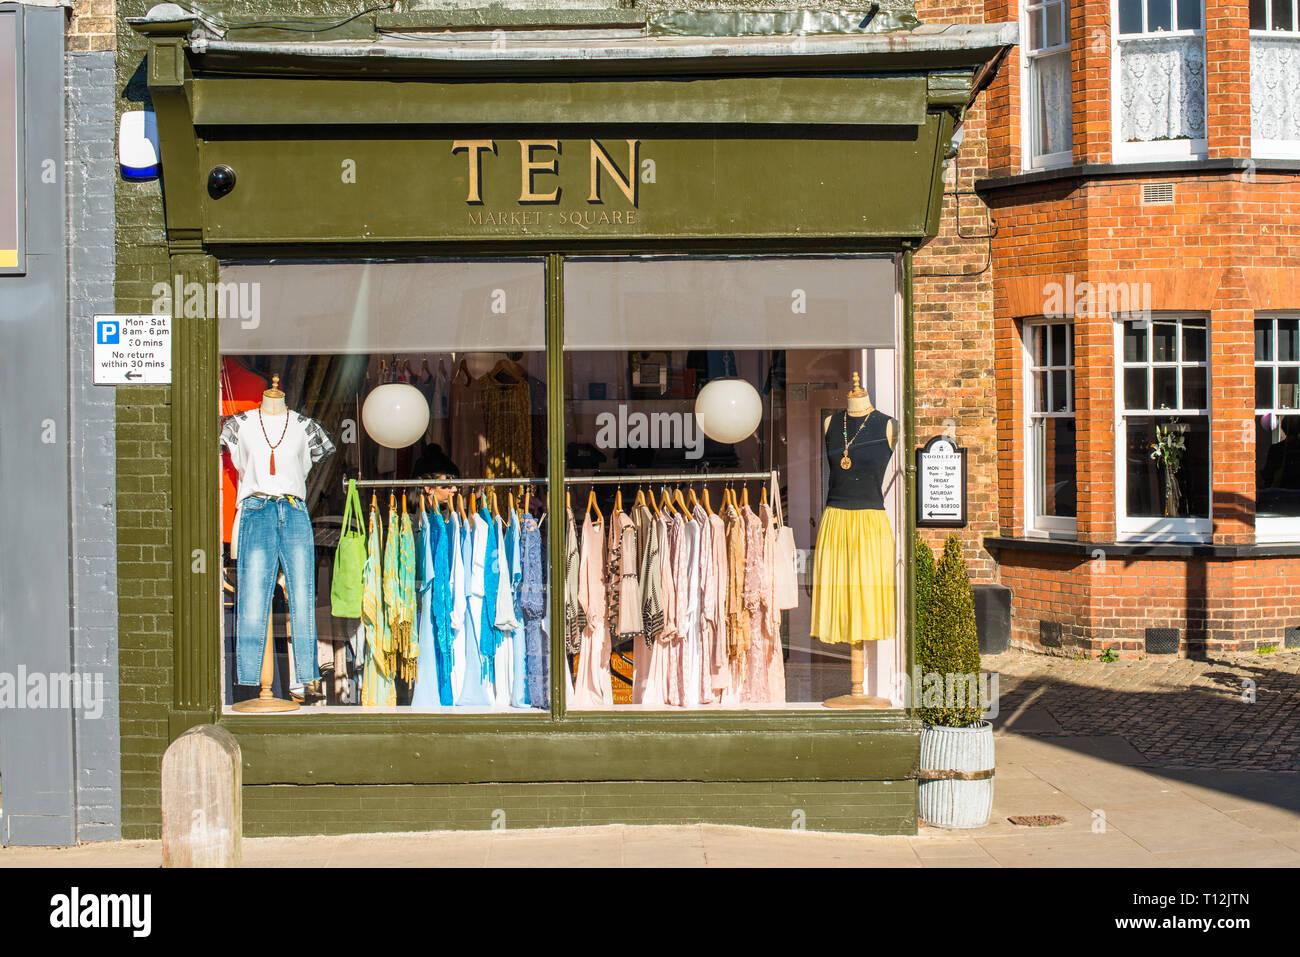 Quaint little dress shop on Market place, Downham Market, Norfolk, East Anglia, England, UK. - Stock Image